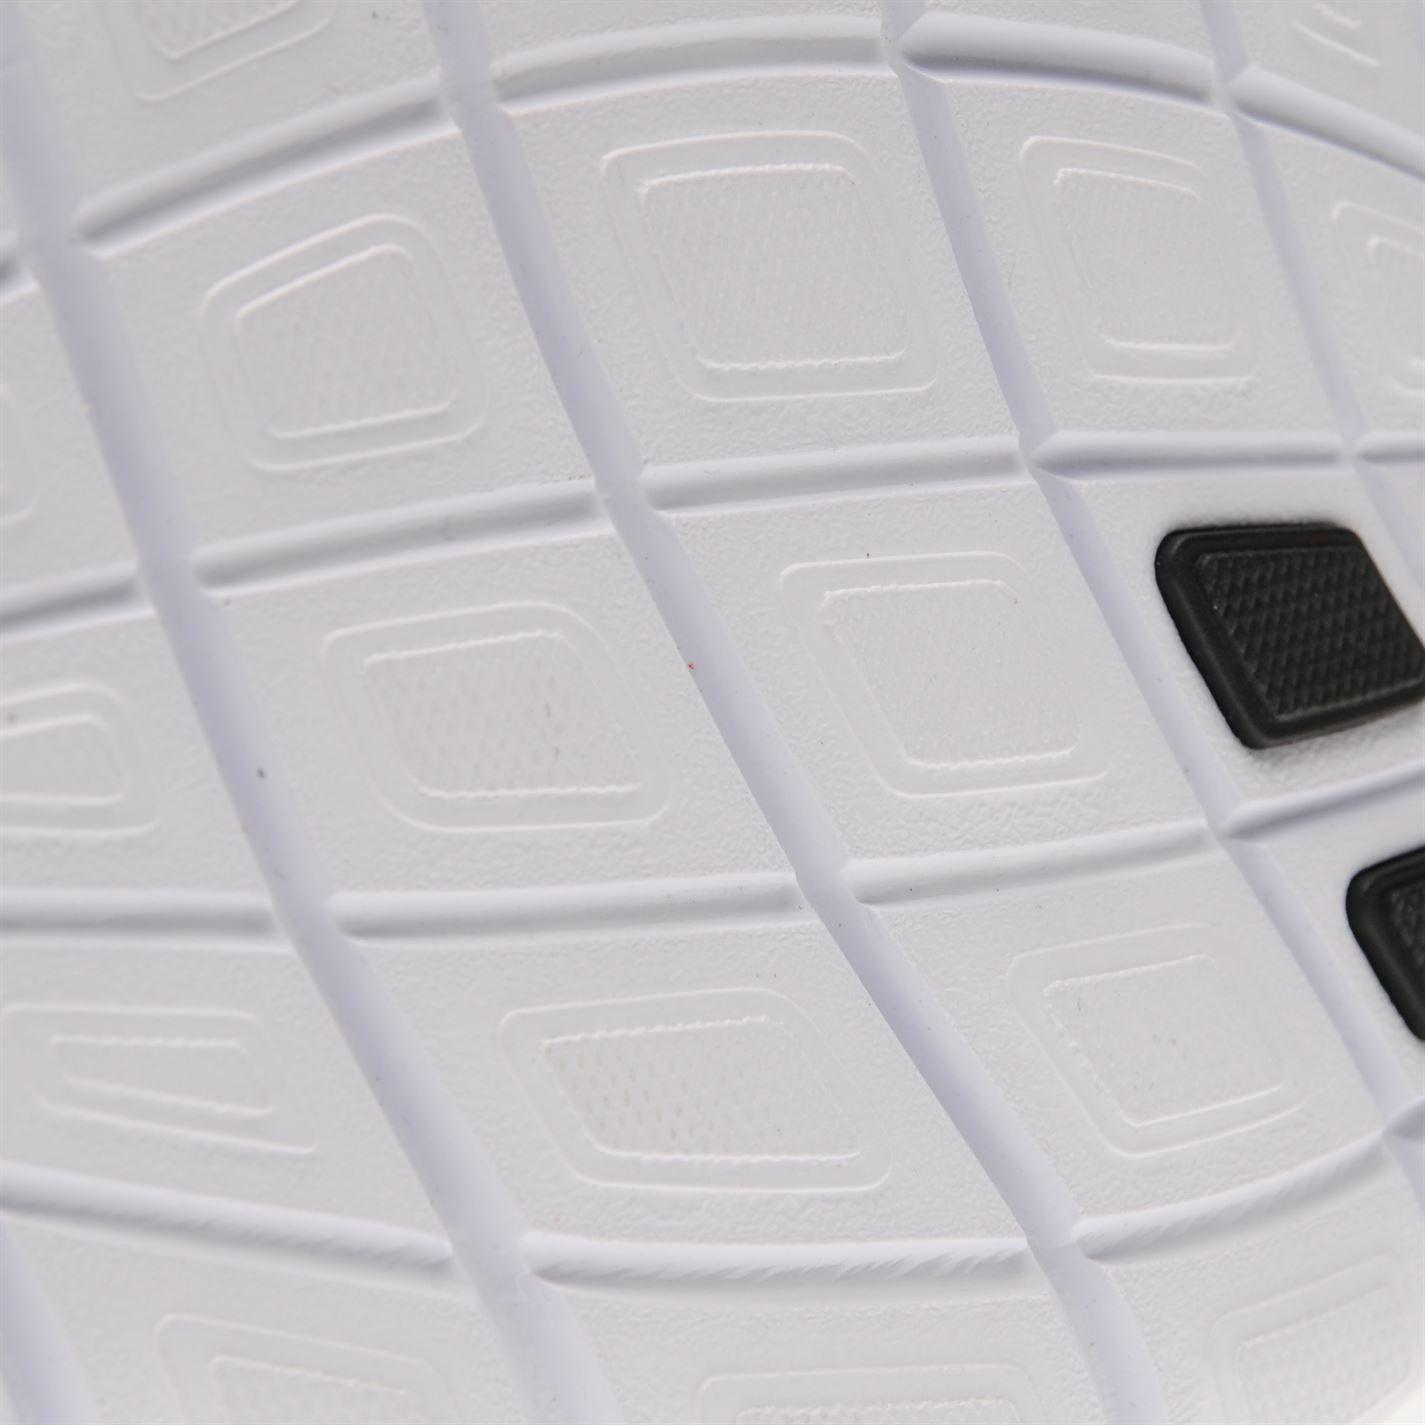 Karrimor-Mens-Duma-Trainers-Lace-Up-Sports-Running-Cross-Training-Shoes thumbnail 21